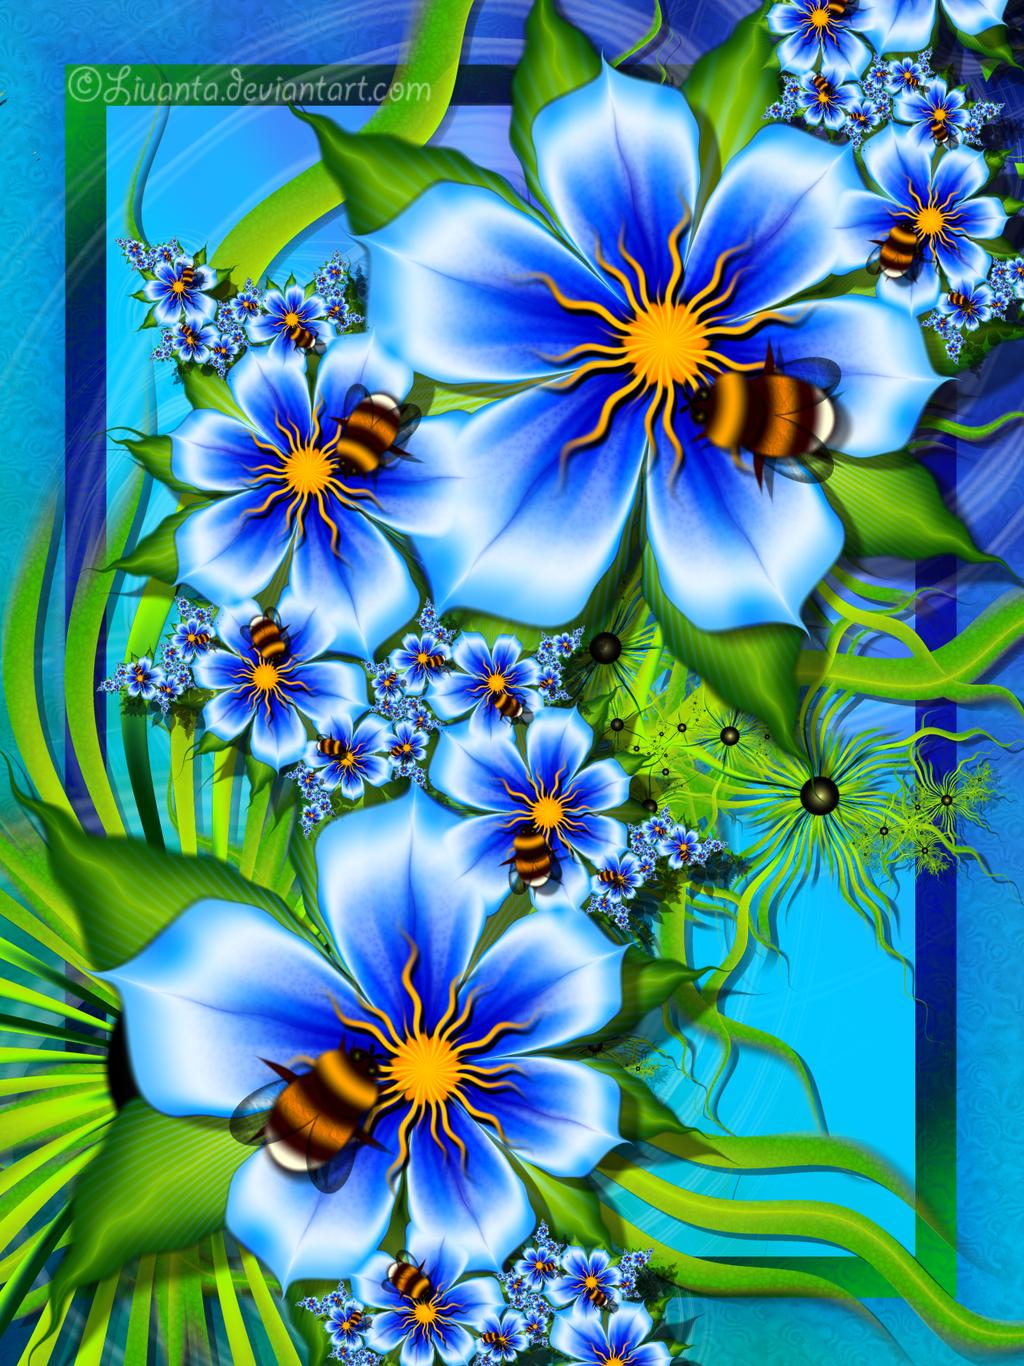 Bumblebees by Liuanta